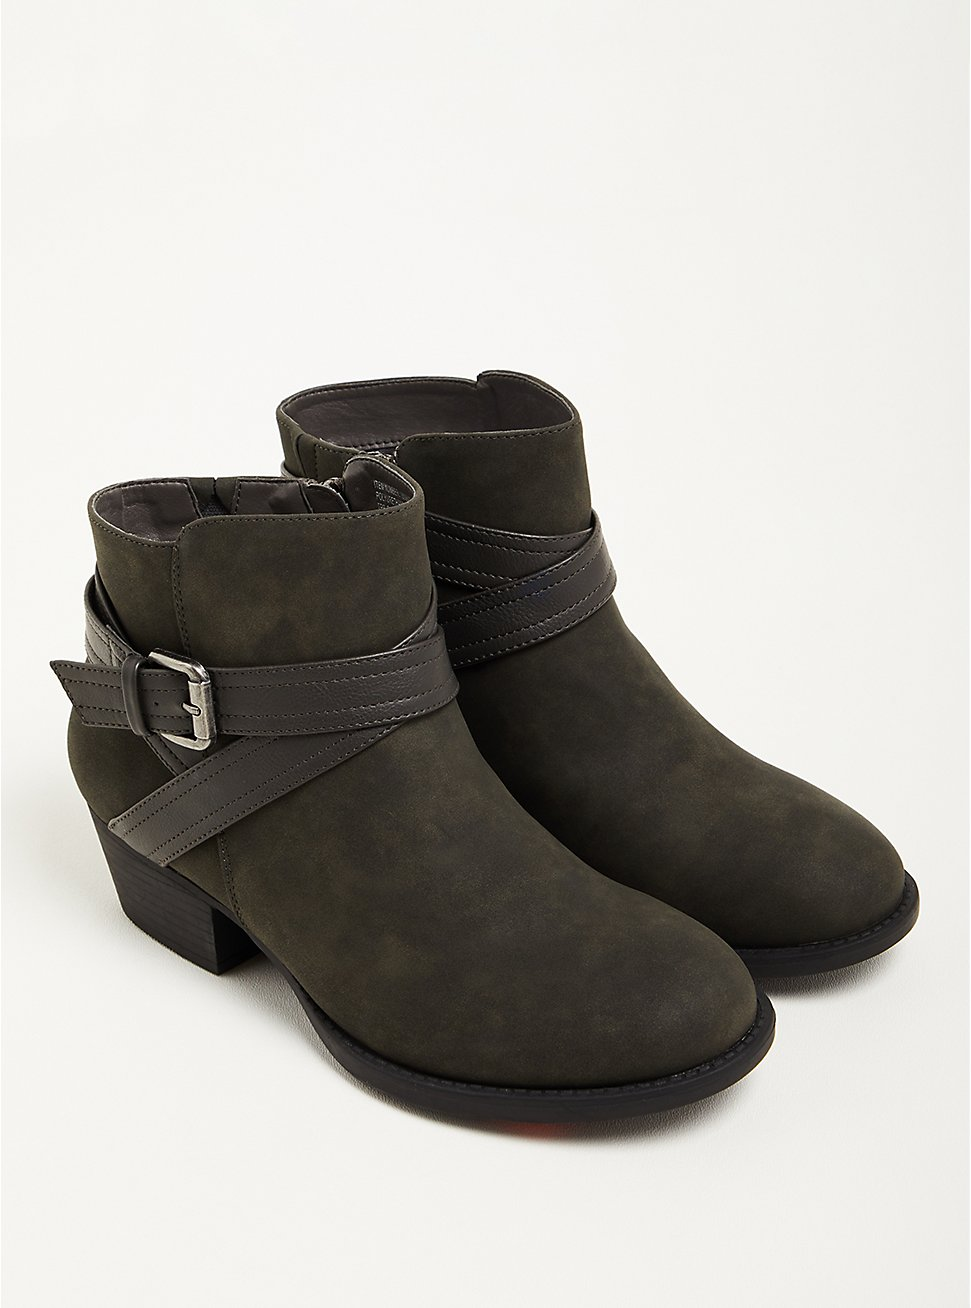 Plus Size Double Strap Ankle Bootie - Grey Faux Leather (WW), GREY, hi-res